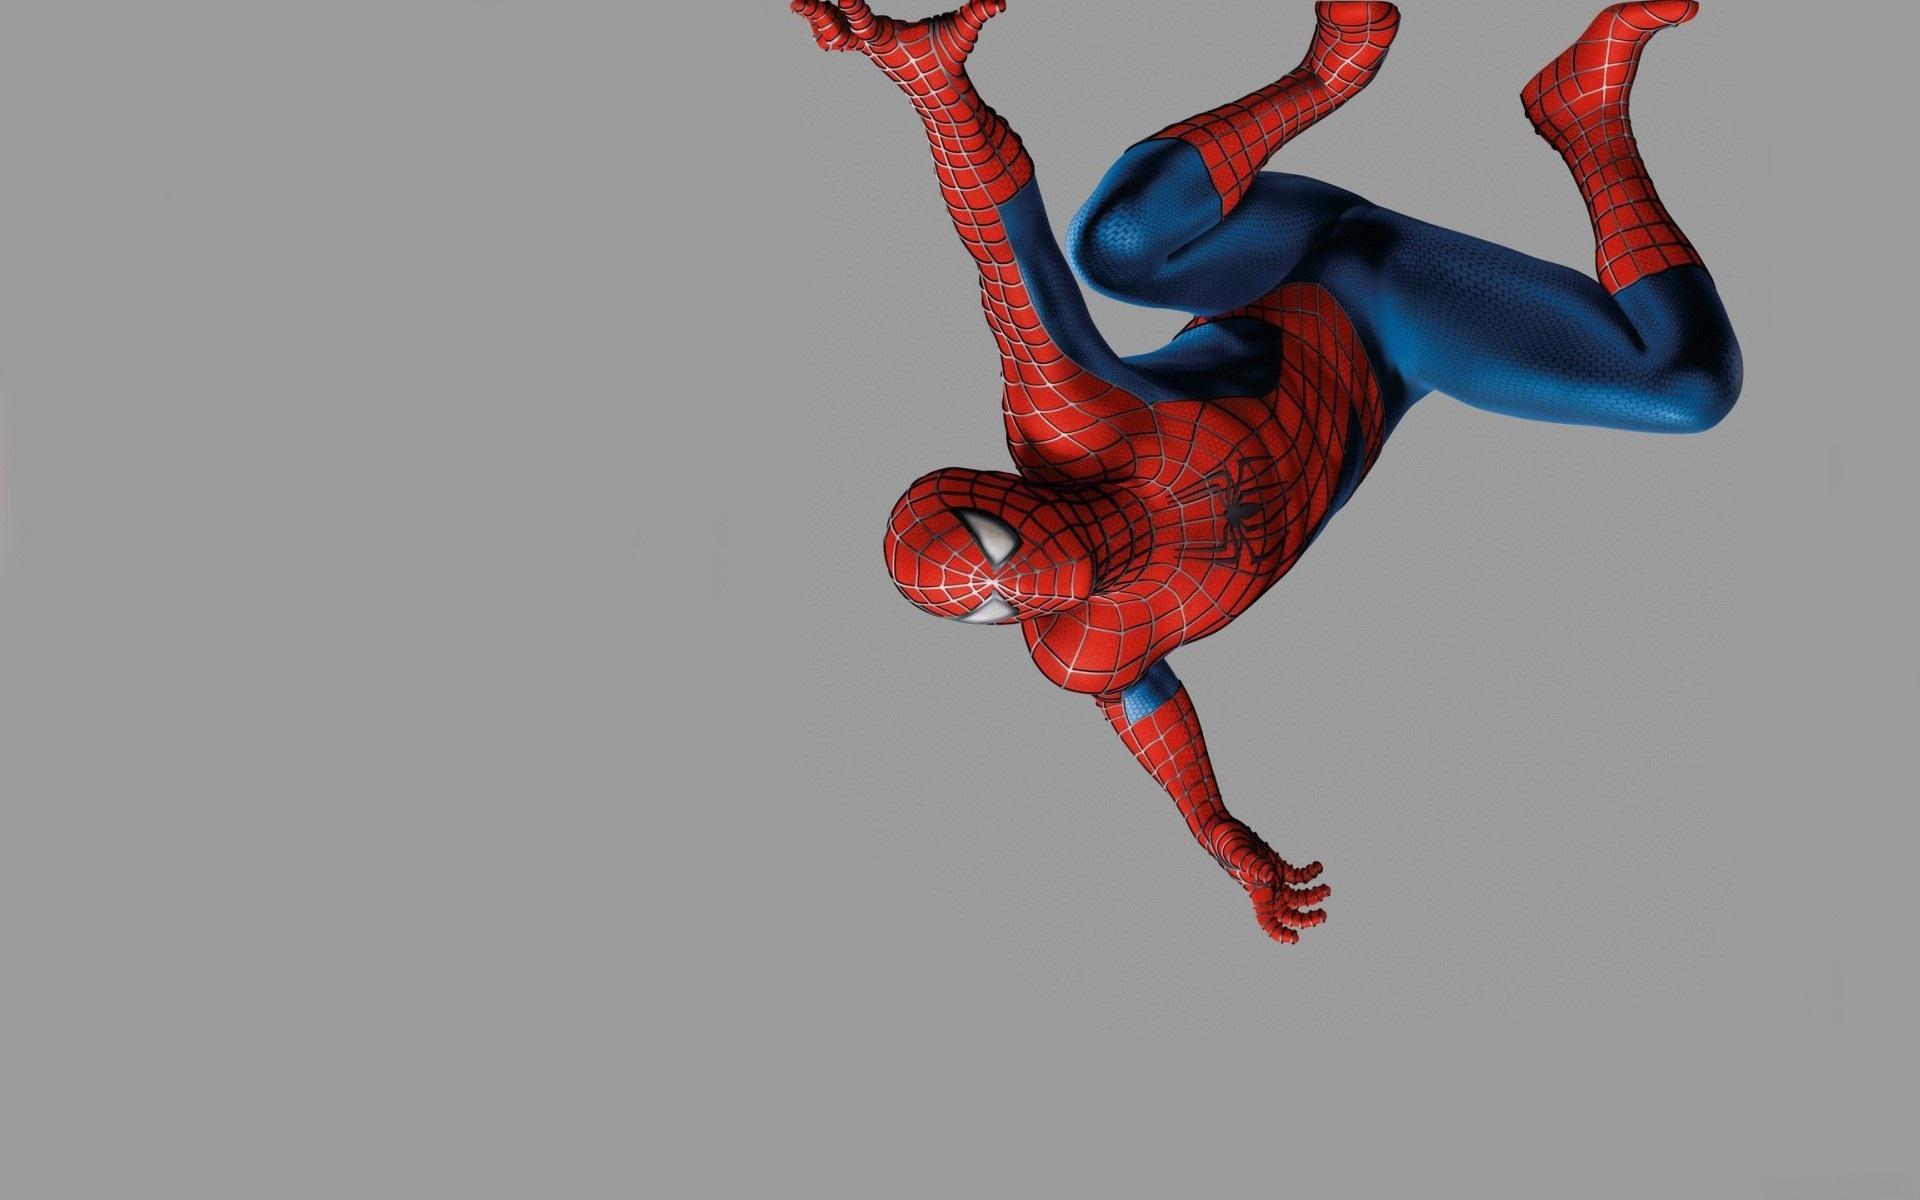 Comics Spider Man 1920x1200